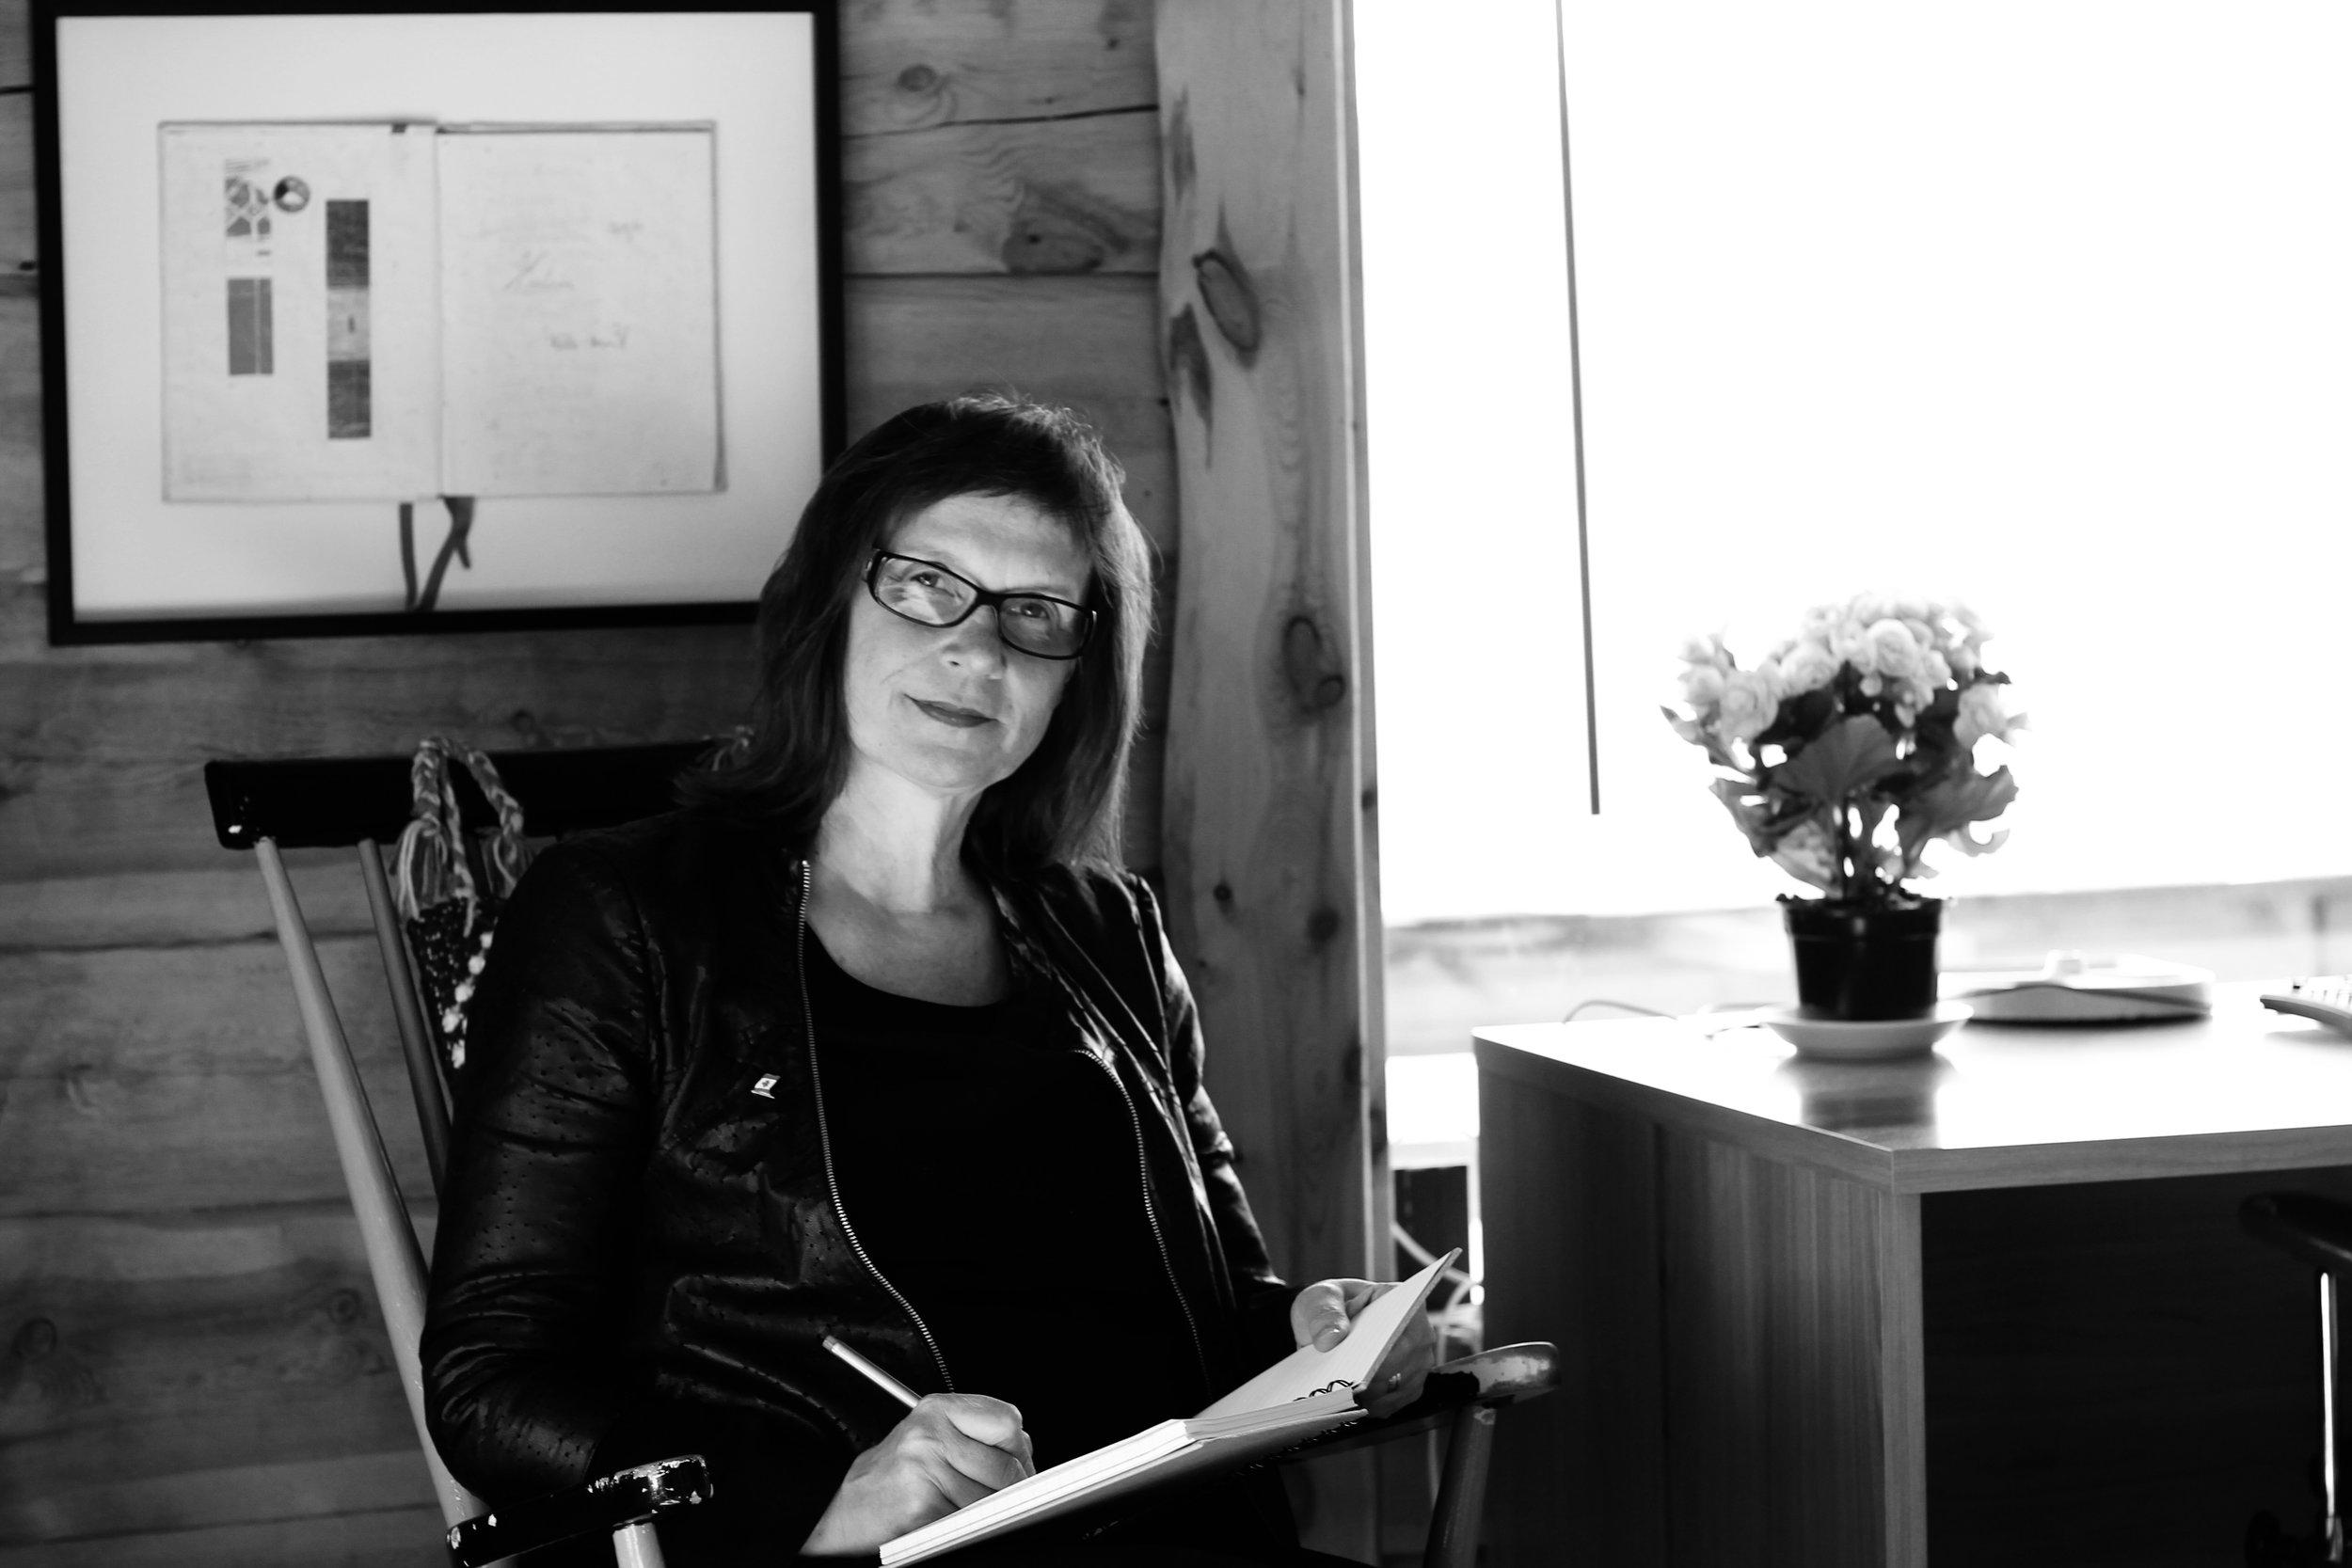 Photo courtesy of Liv Inger Somby.